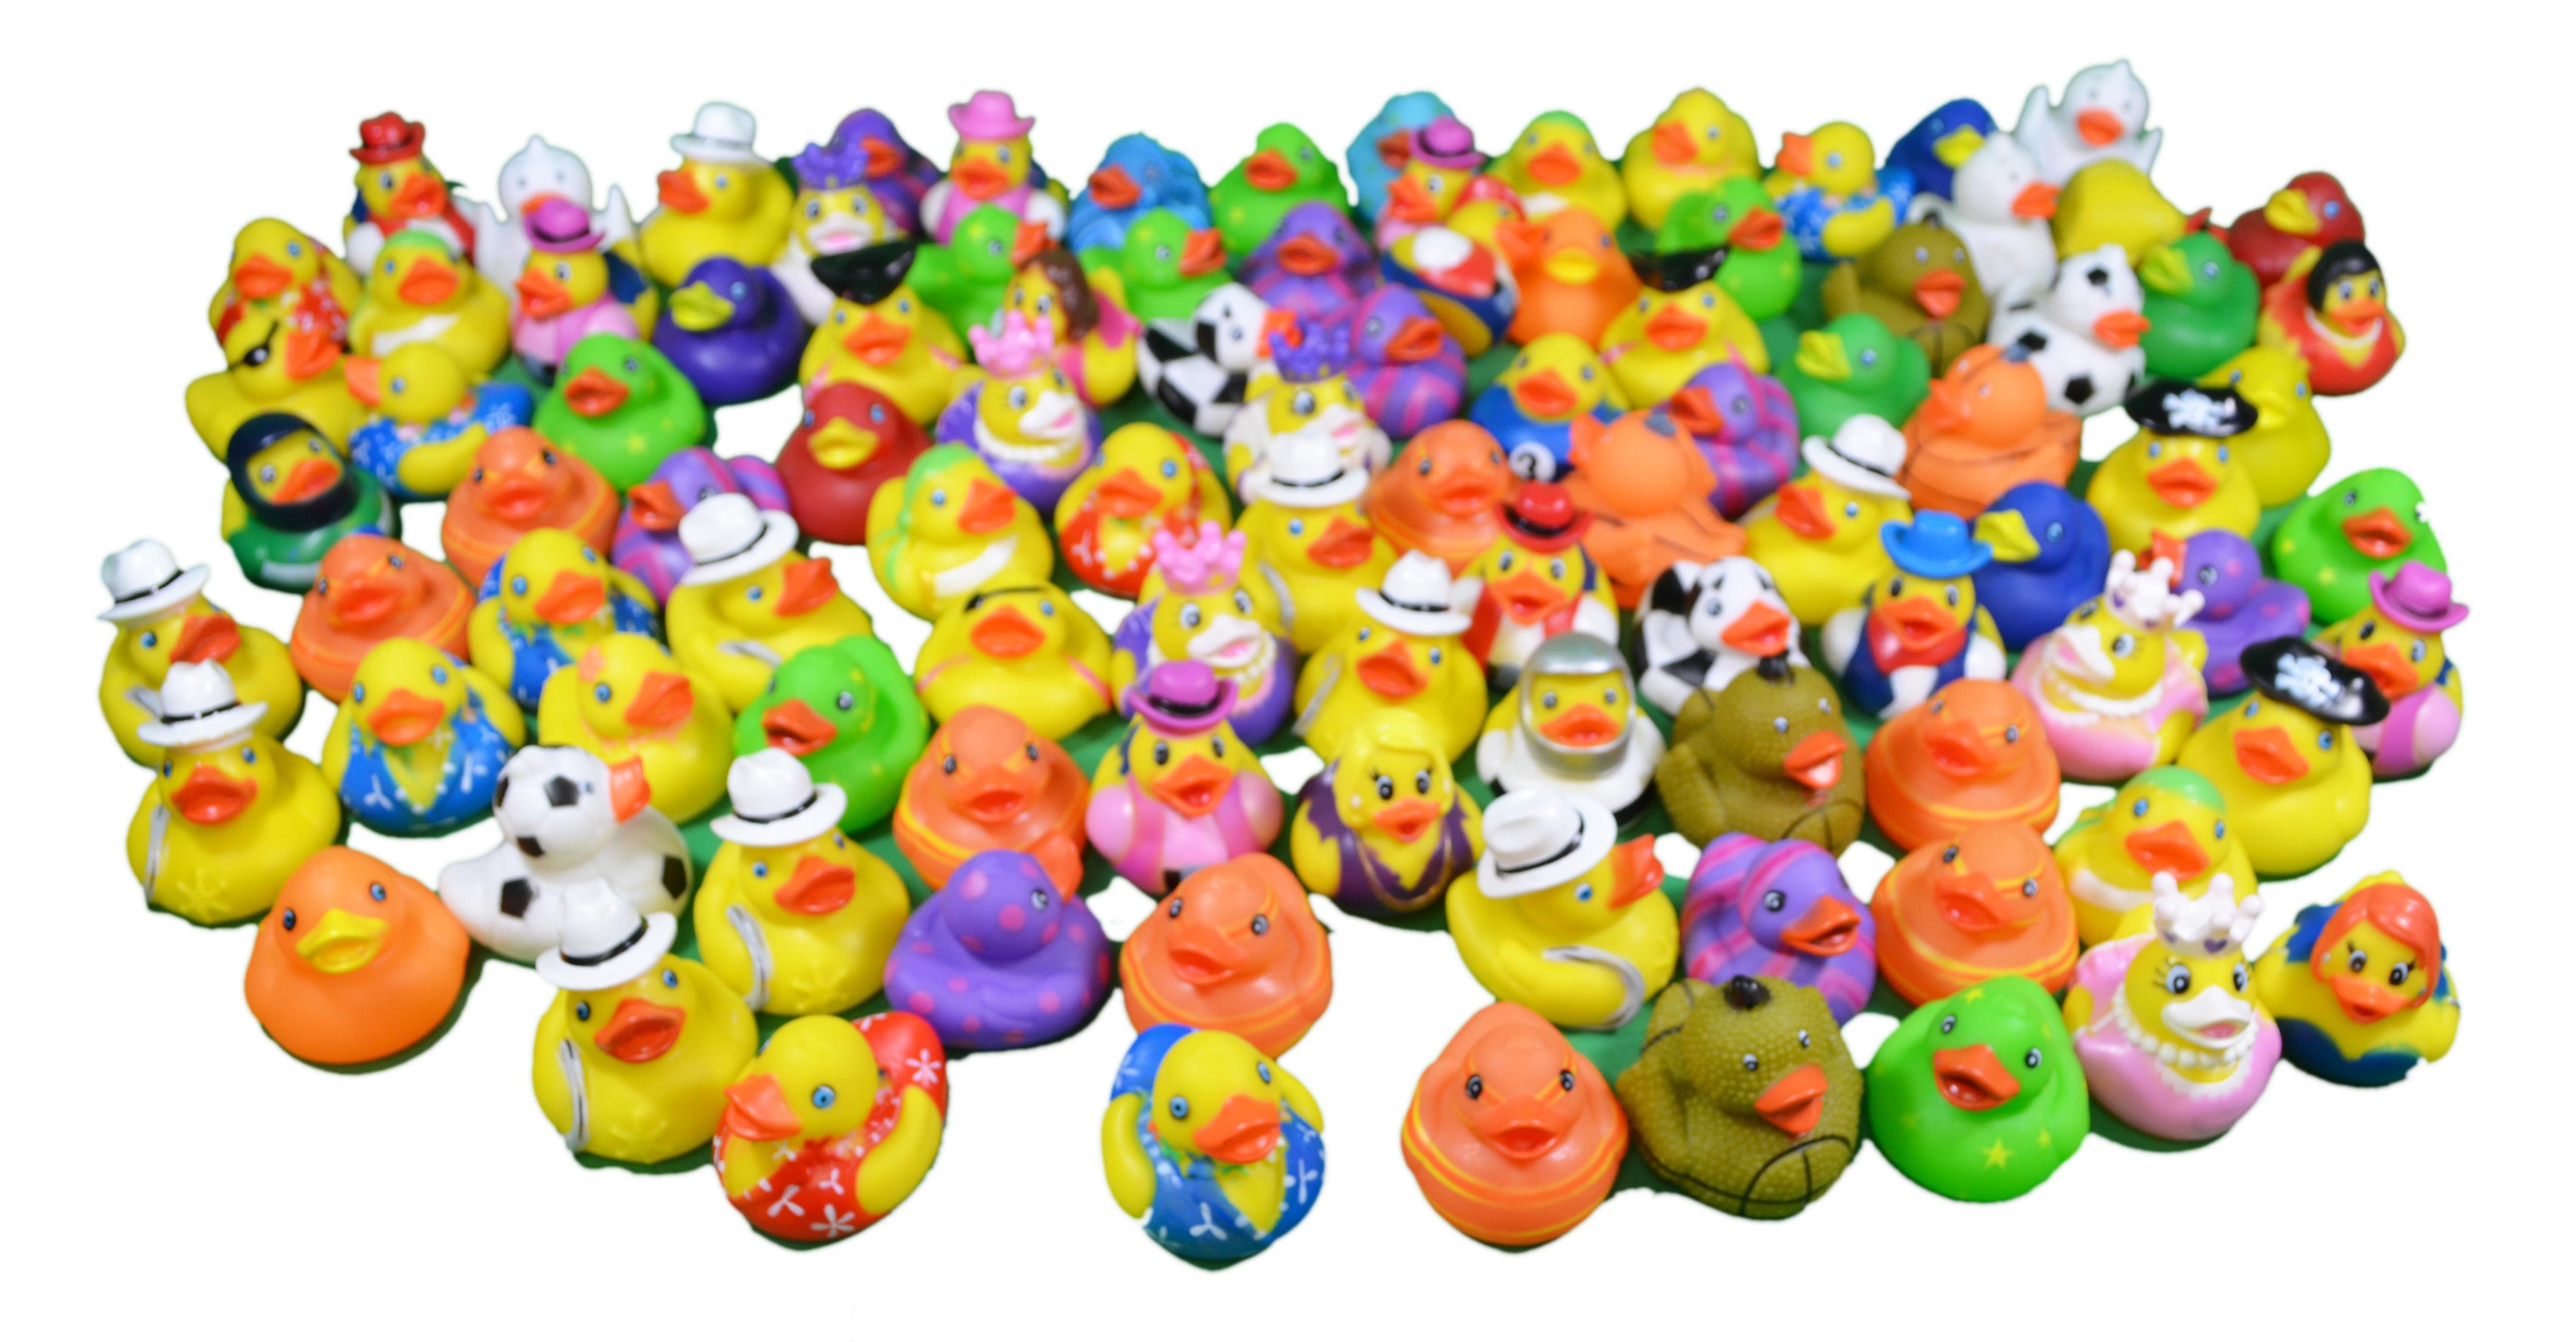 Rhode Island Novelty Assorted Mini Rubber Ducks - 100 Pack - 1 Super ...